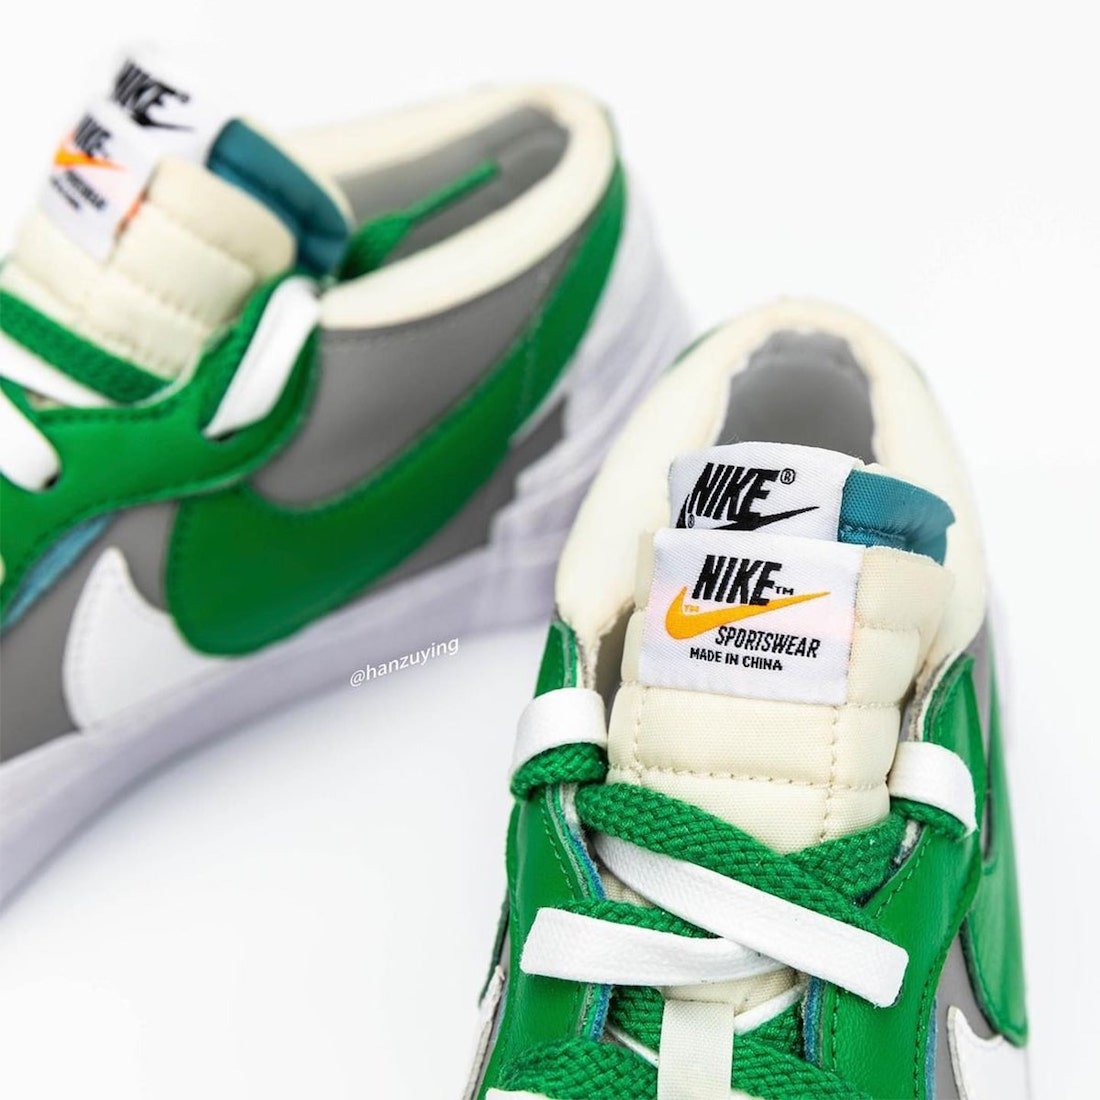 sacai nike blazer low classic green release date DD1877 001 5